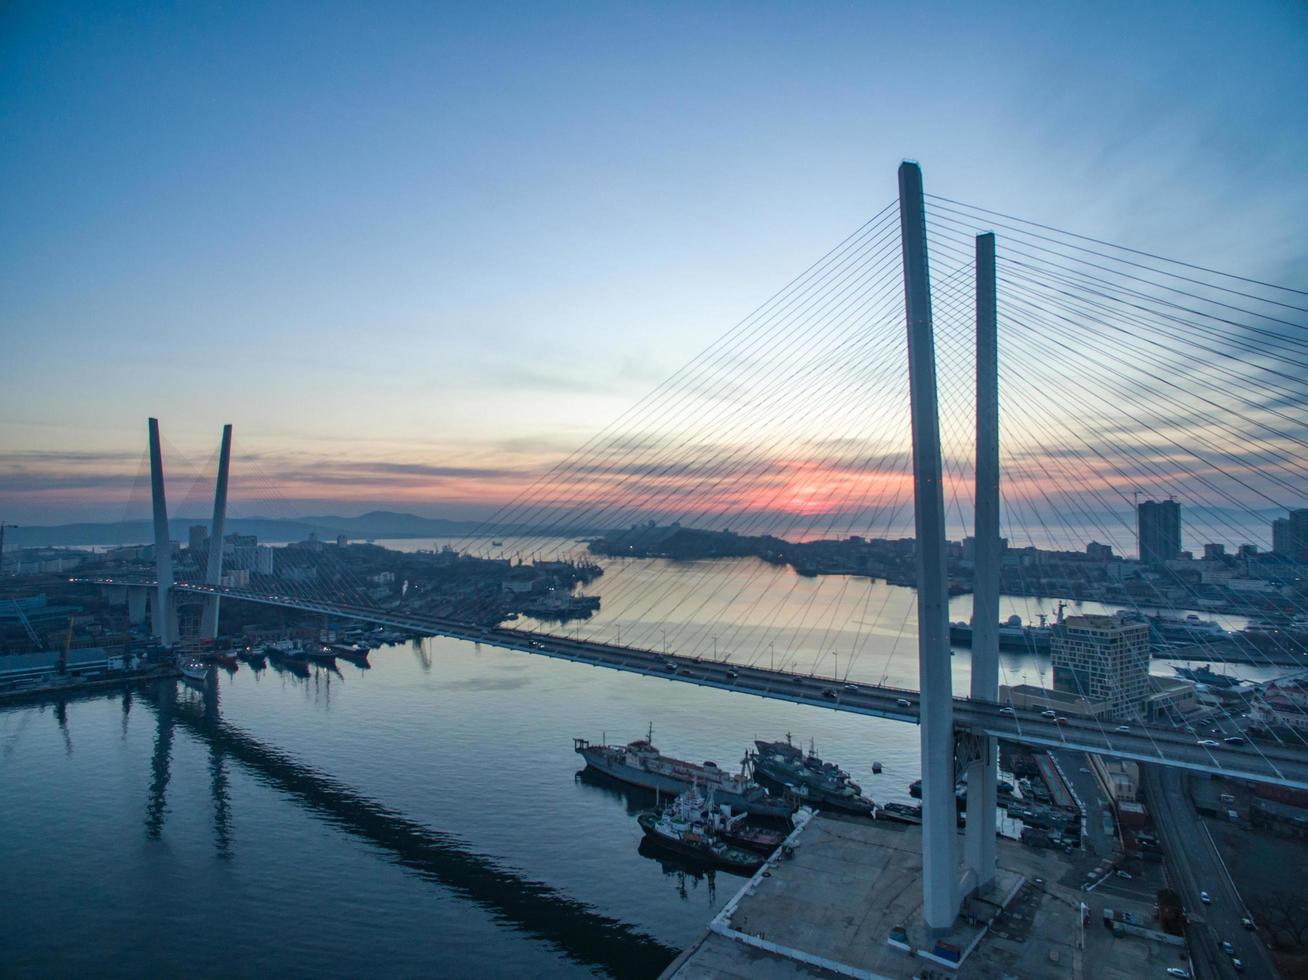 Zolotoy-Brücke und Wasser gegen bewölkten Sonnenunterganghimmel in Wladiwostok, Russland foto